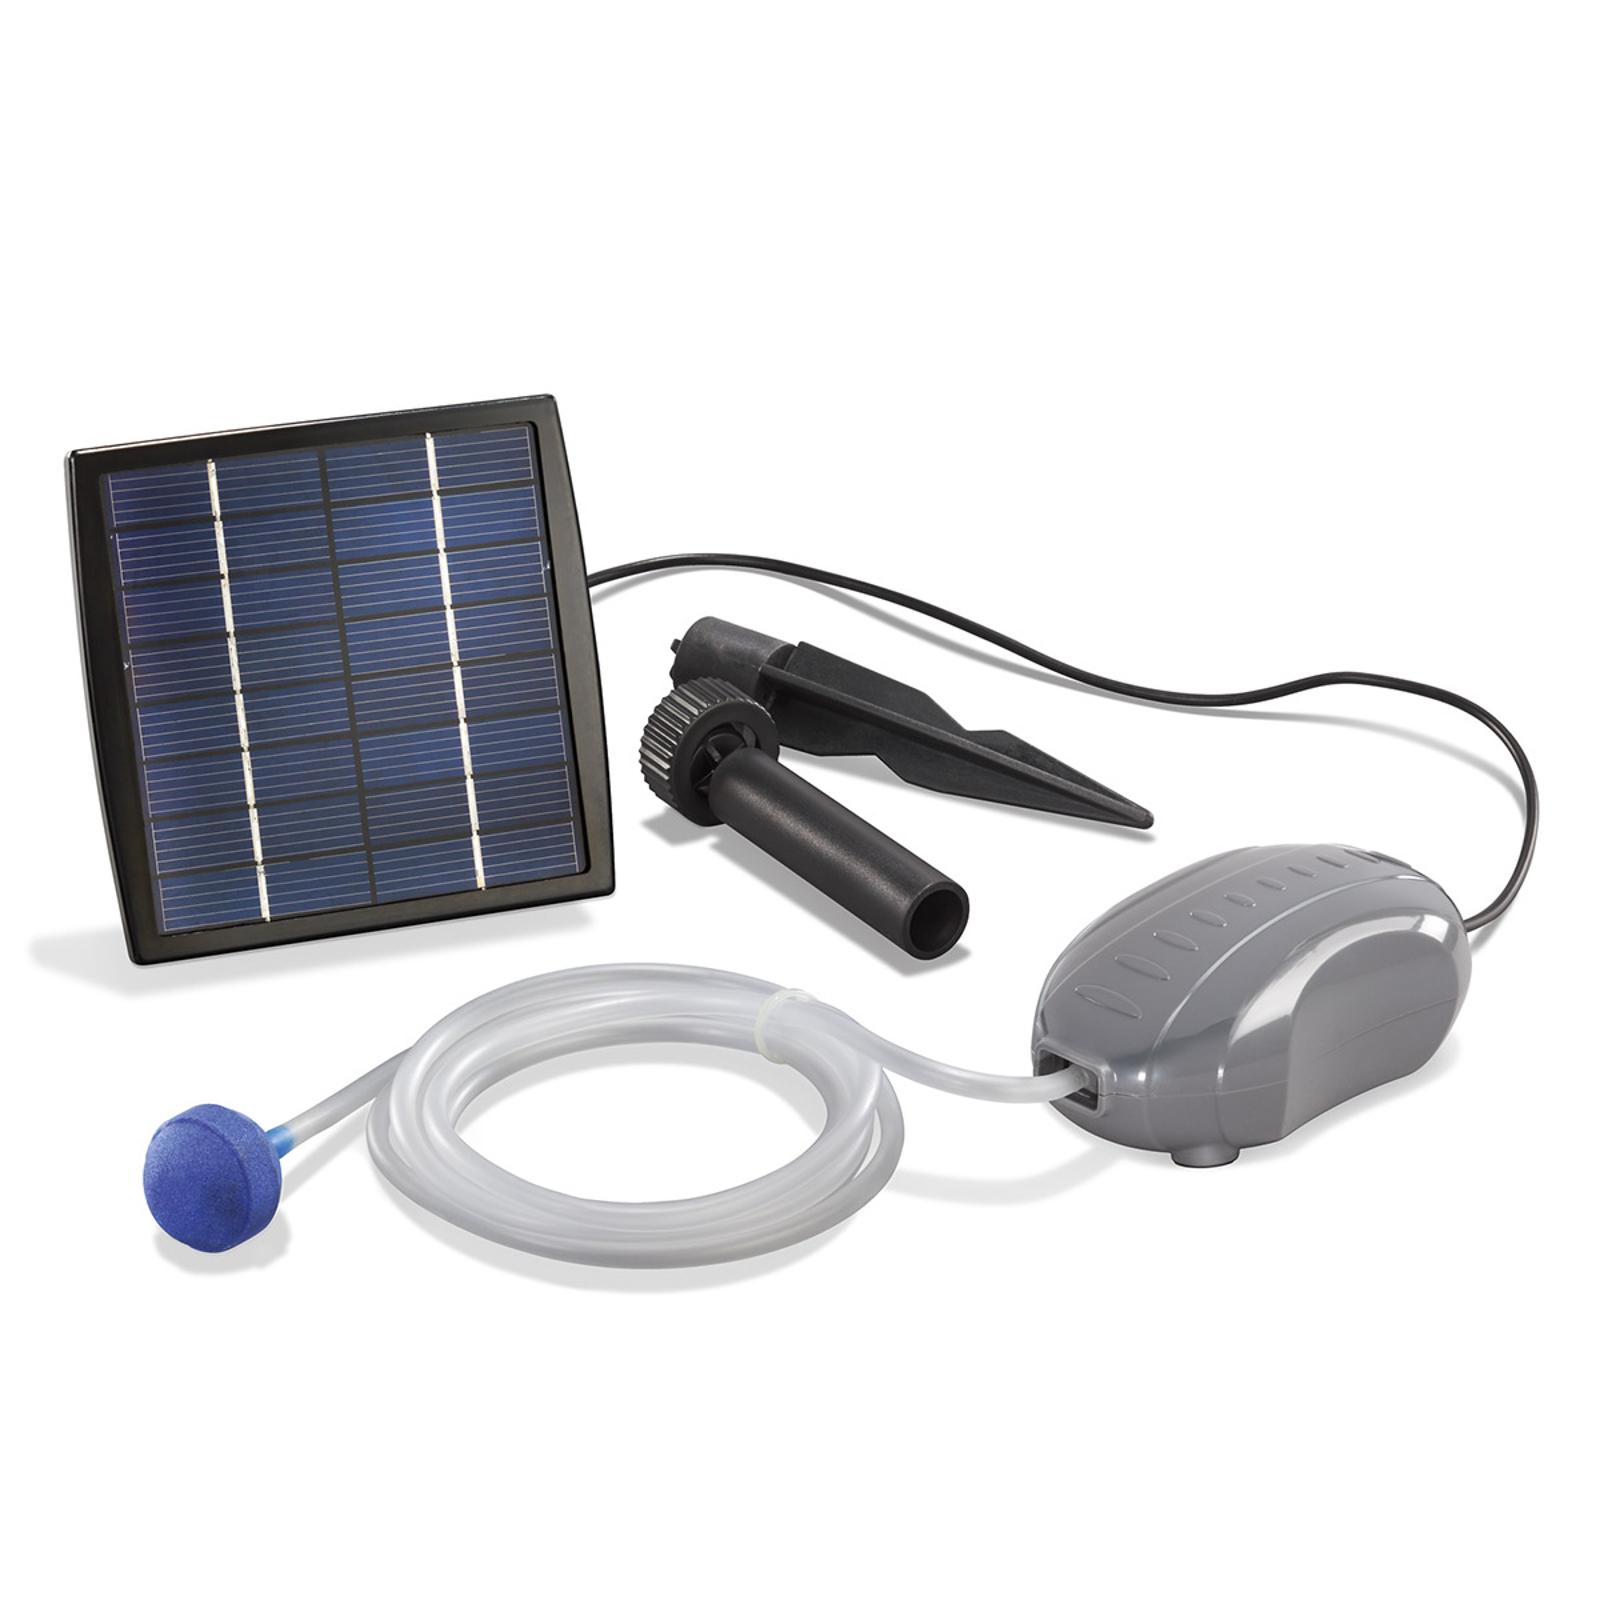 Vijverventilator op zonne-energie SOLAR AIR-S